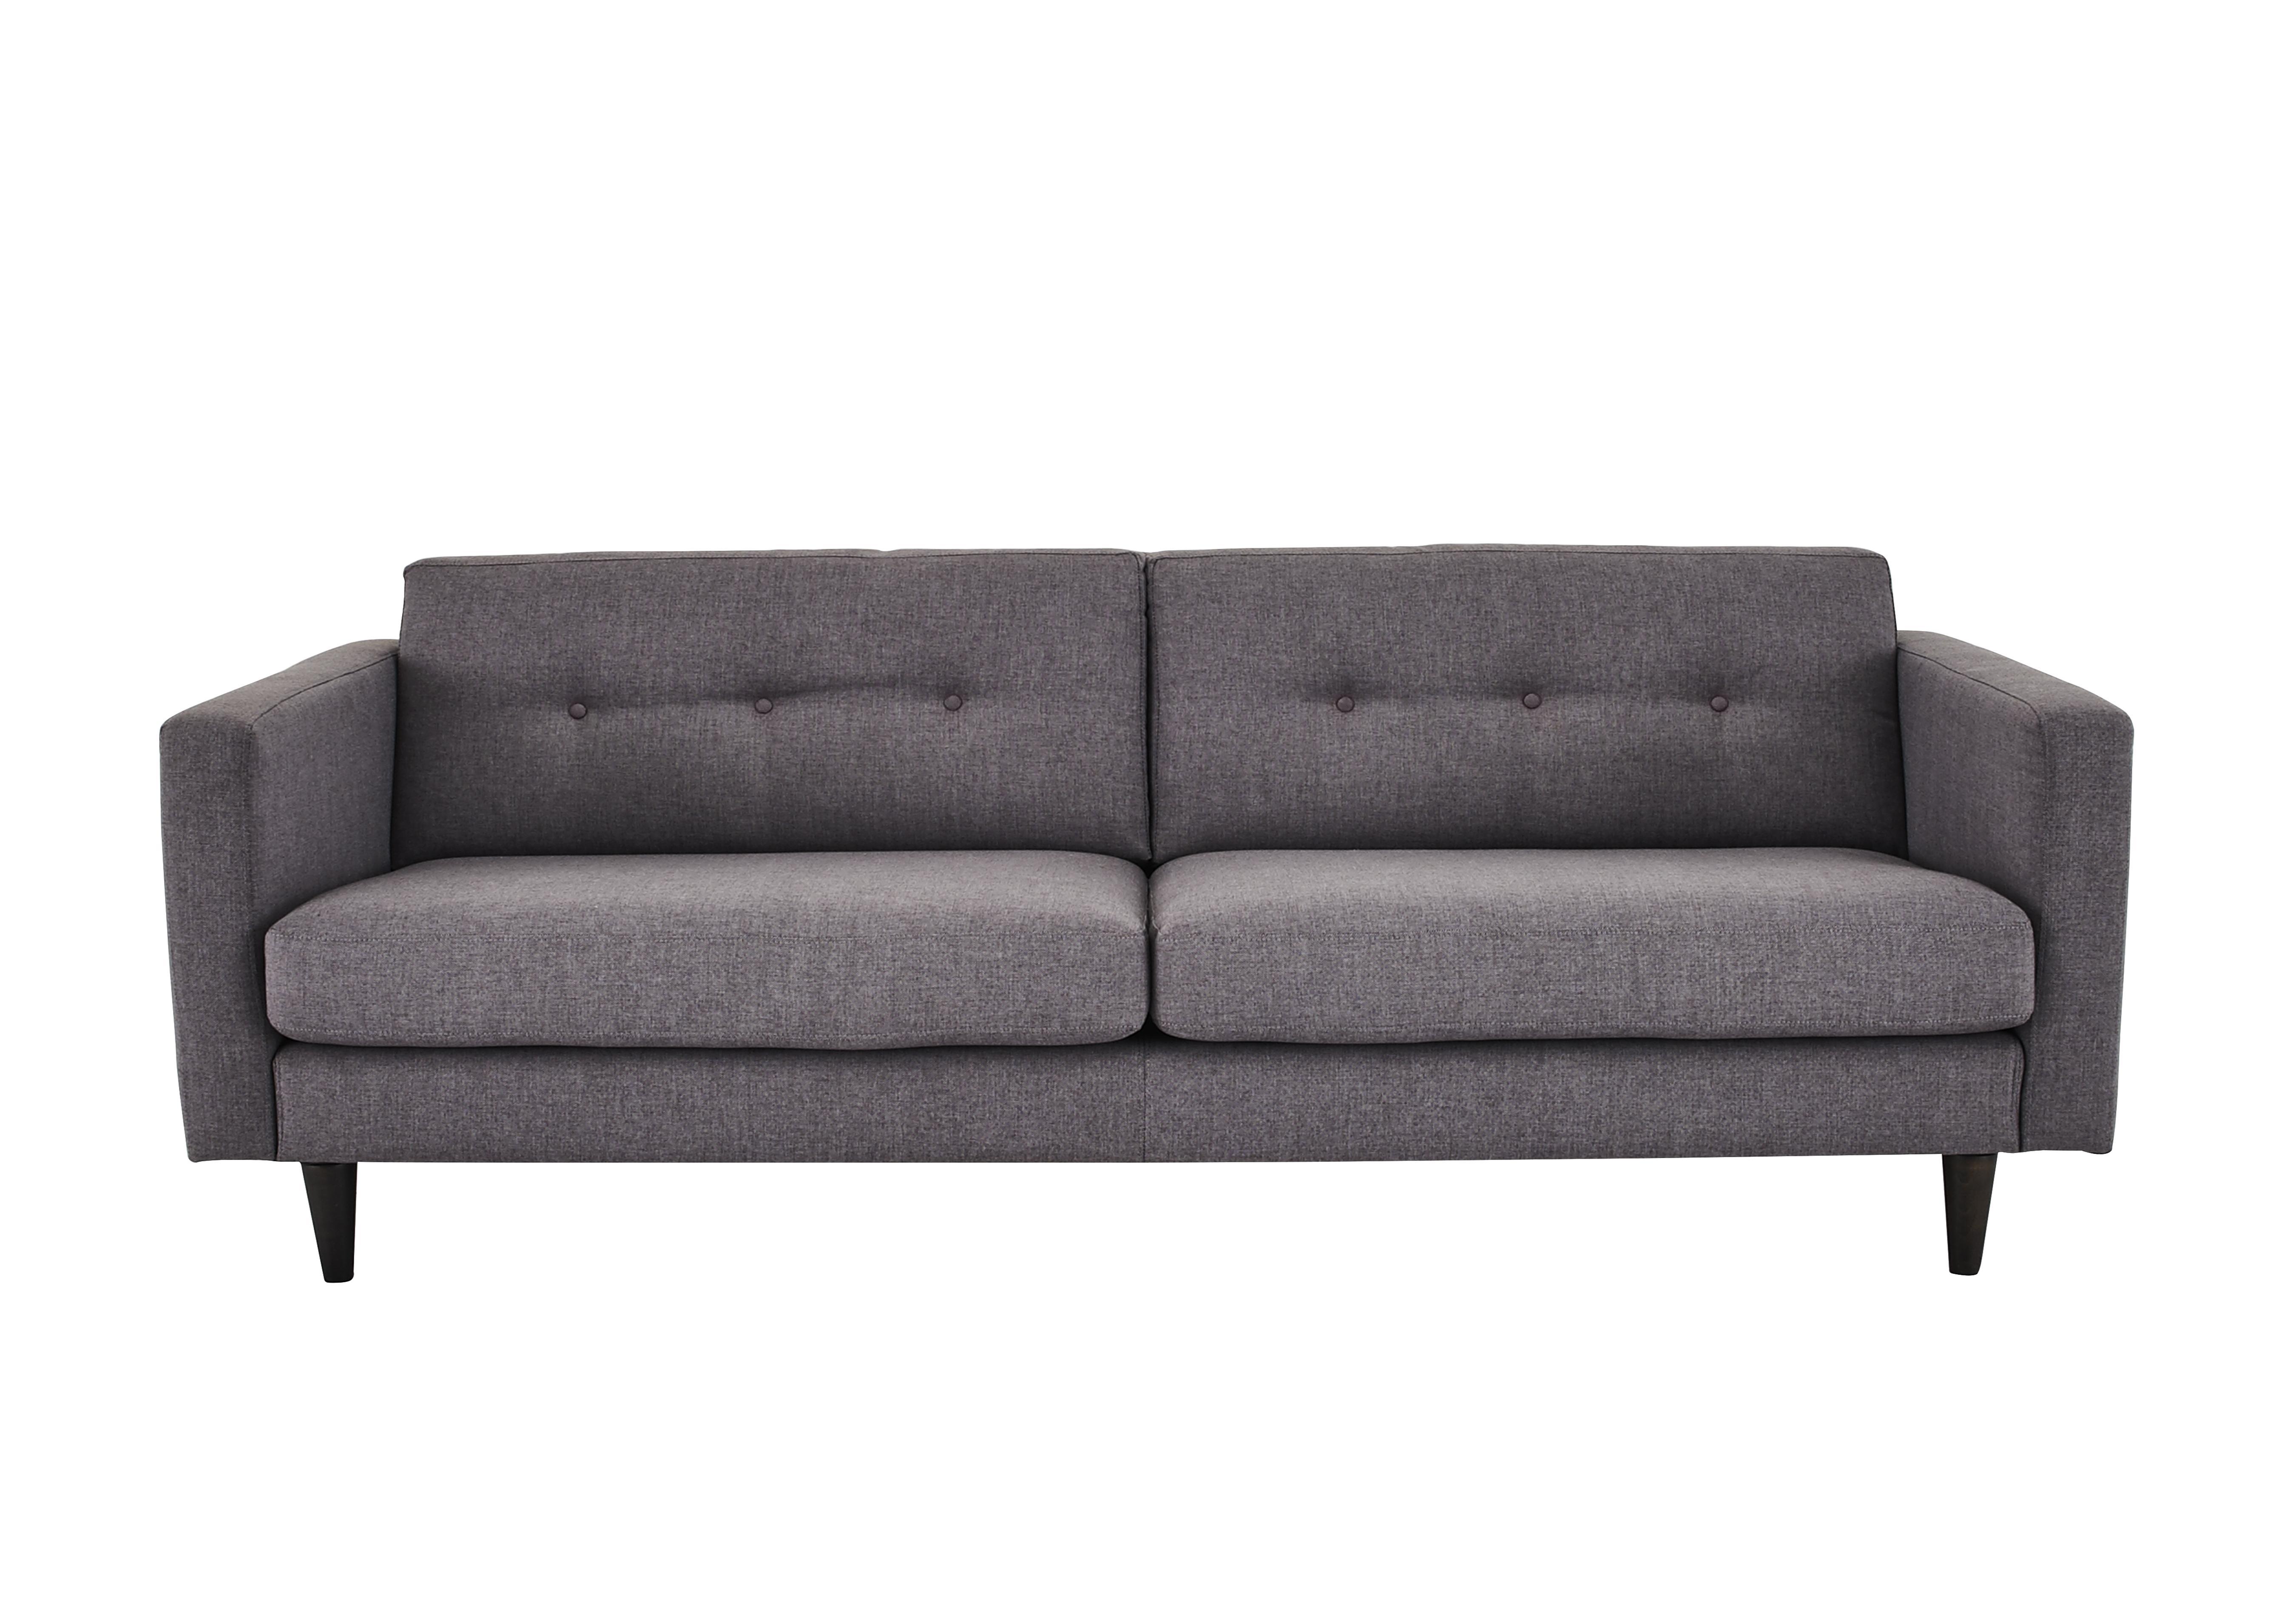 fable corner sofa furniture village records philadelphia sofas fabric | brokeasshome.com